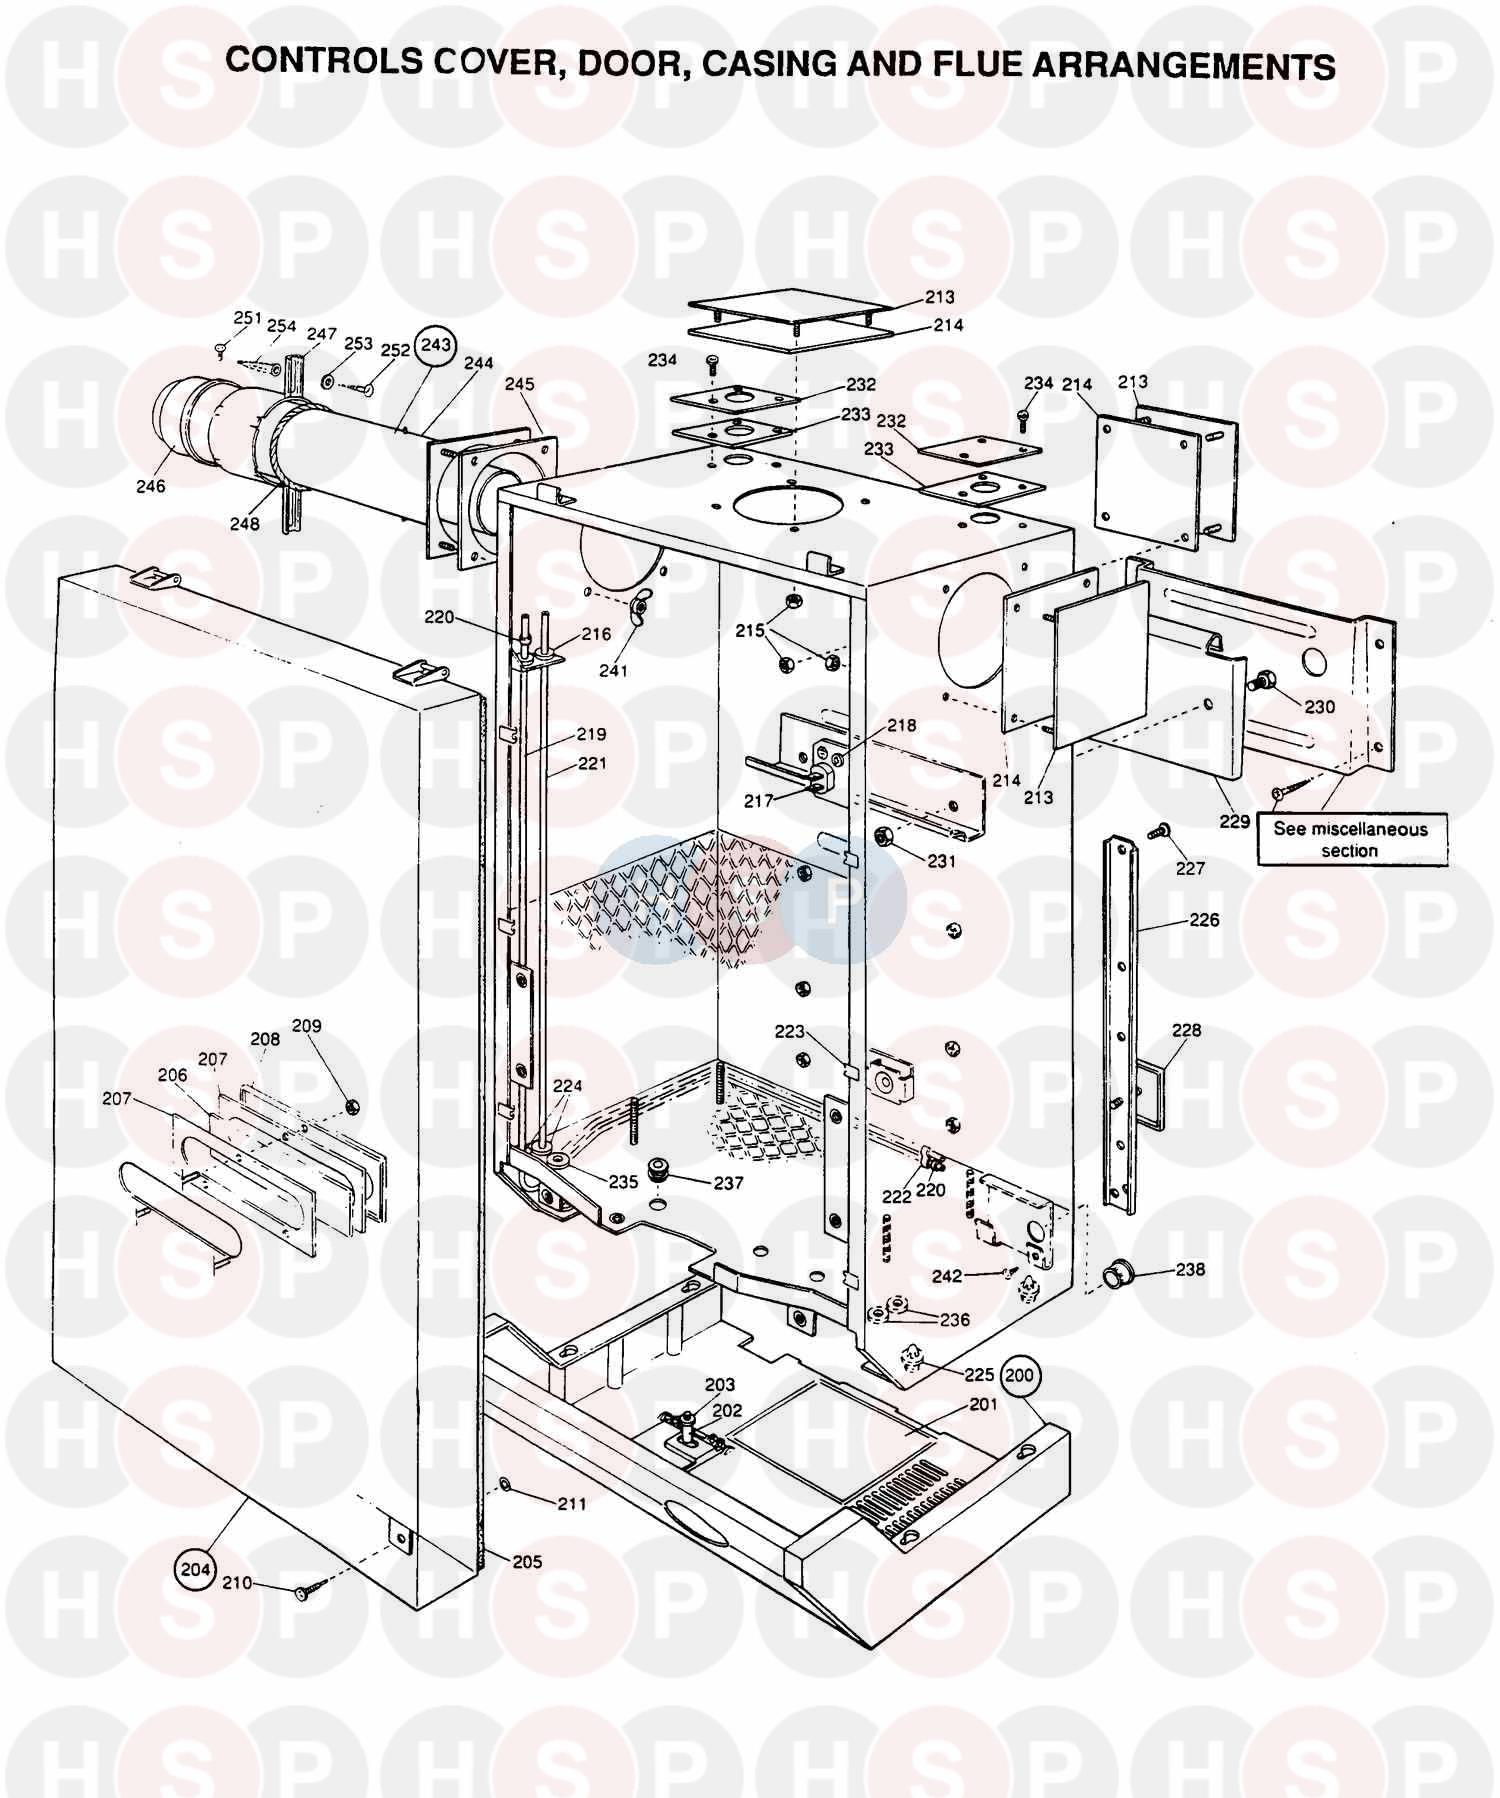 Potterton SCOTTISH GAS 50 F2 Appliance Diagram (Controls